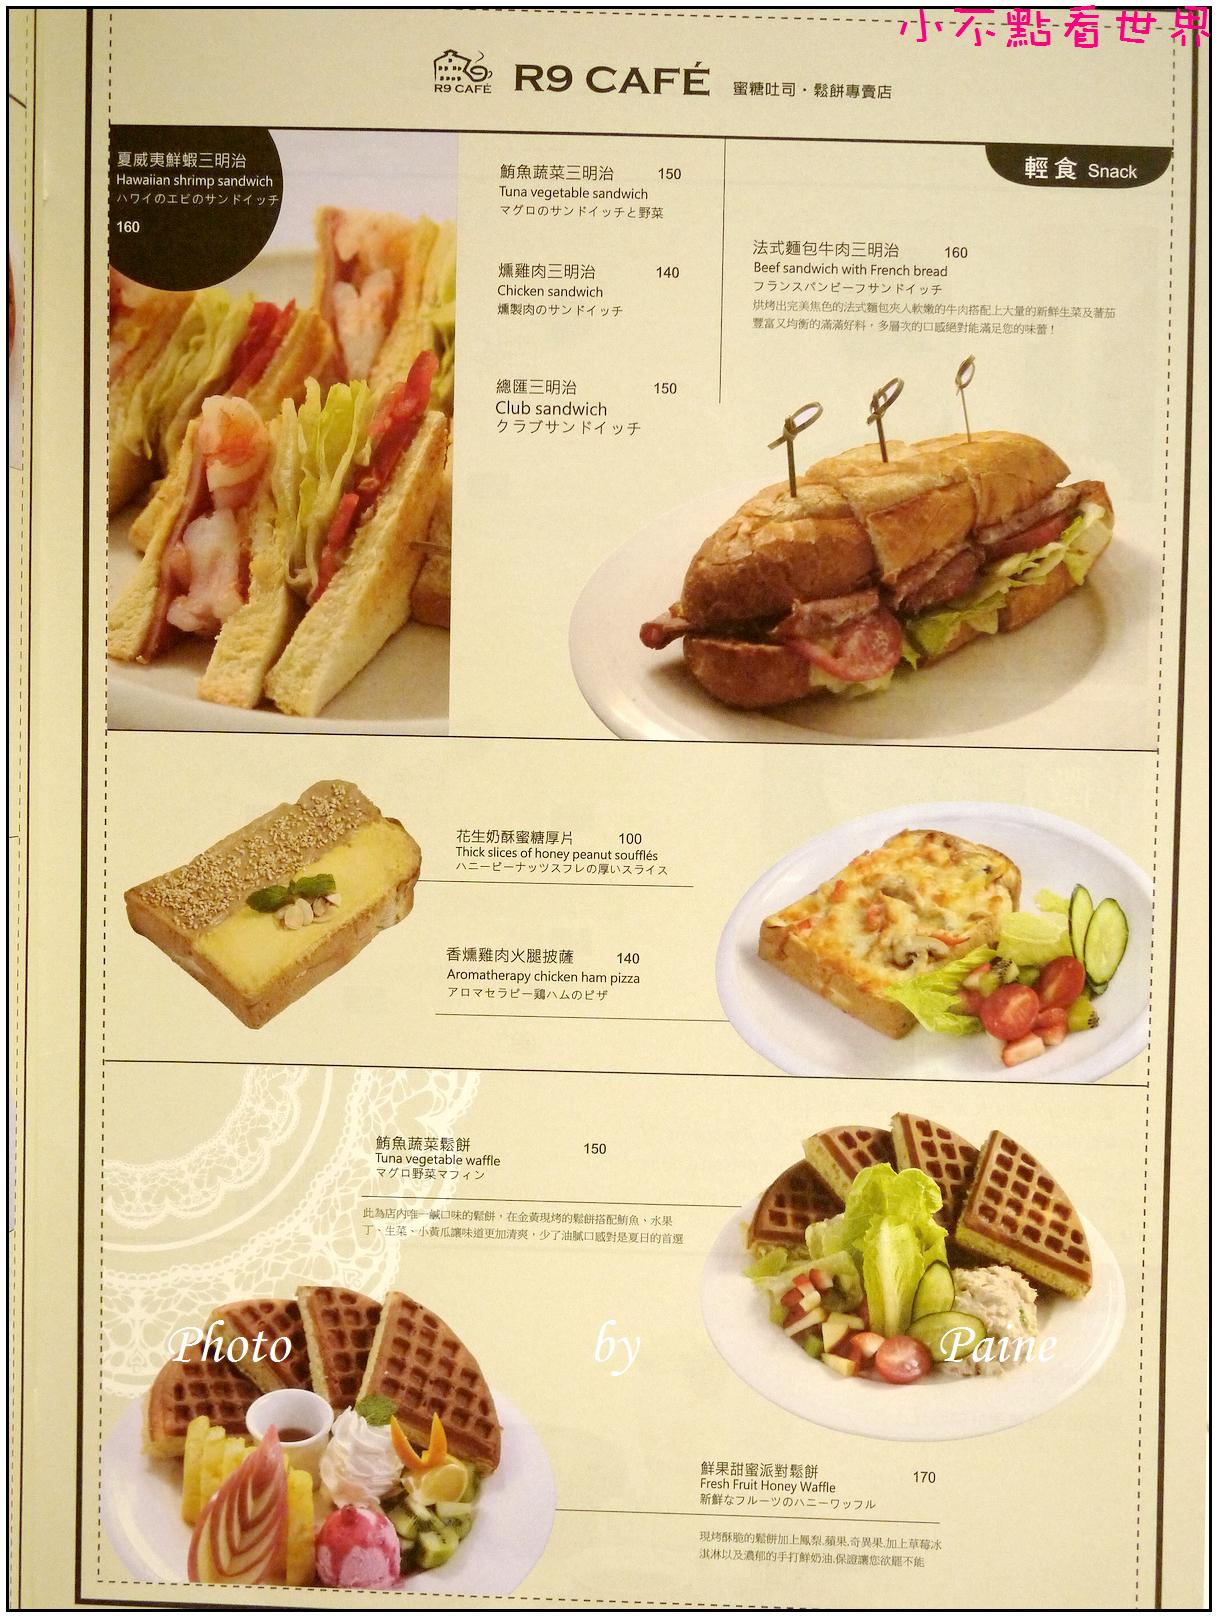 桃園R9 CAFE (23).JPG